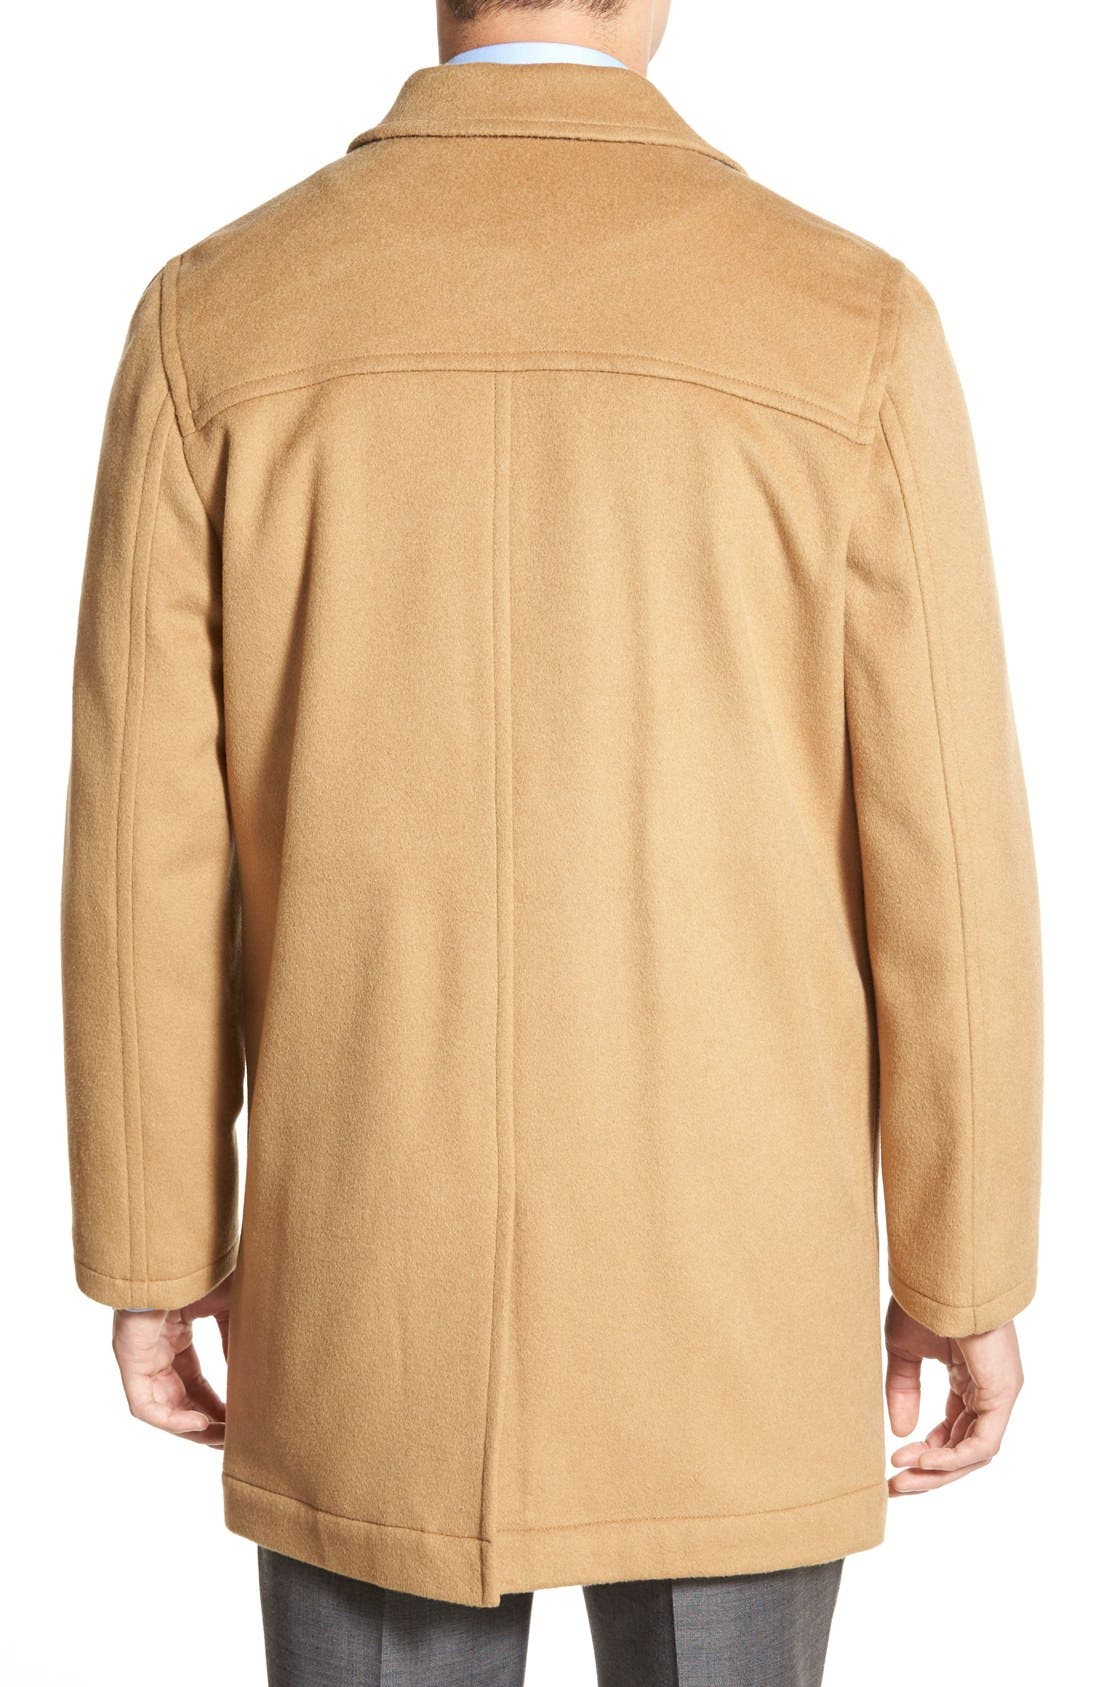 Douglas Modern Fit Wool & Cashmere Overcoat,                             Alternate thumbnail 2, color,                             Camel